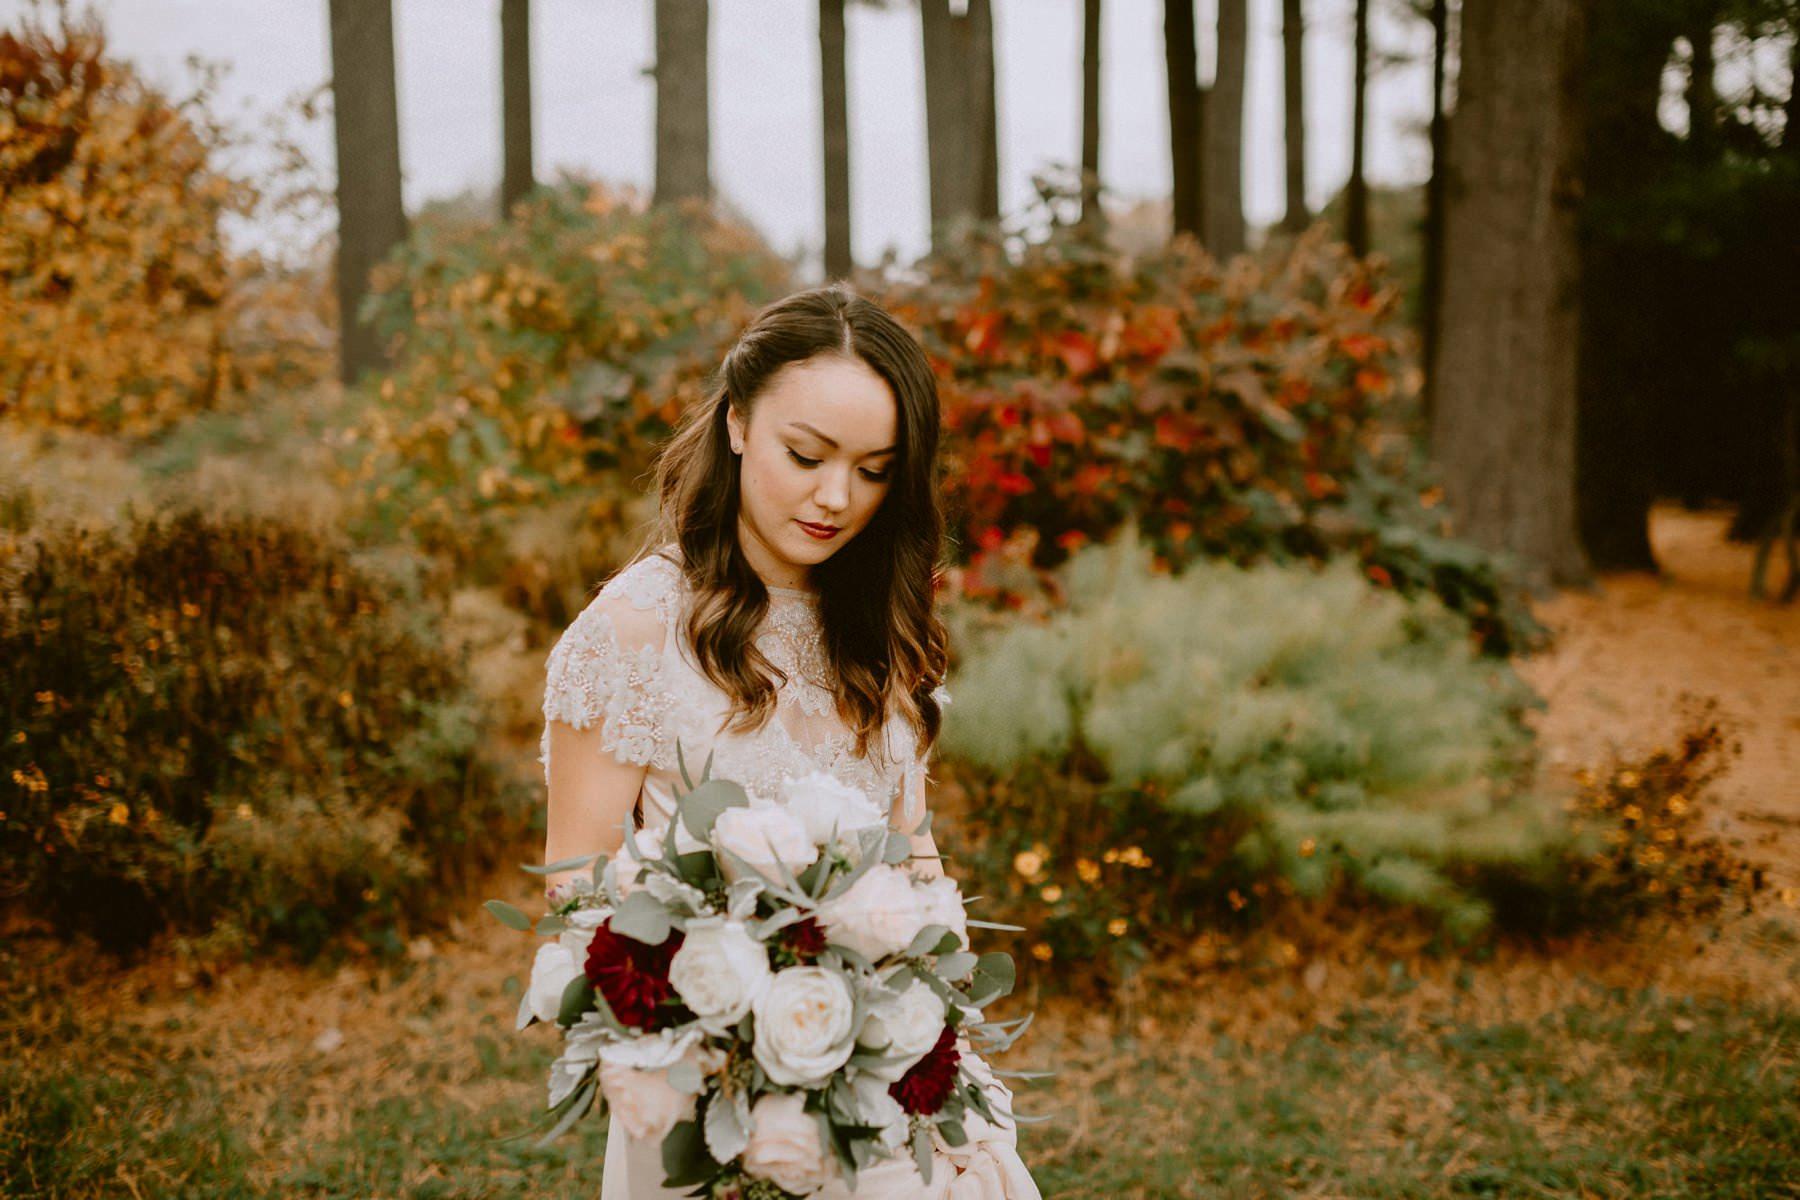 Tyler_arboretum_wedding-018.jpg